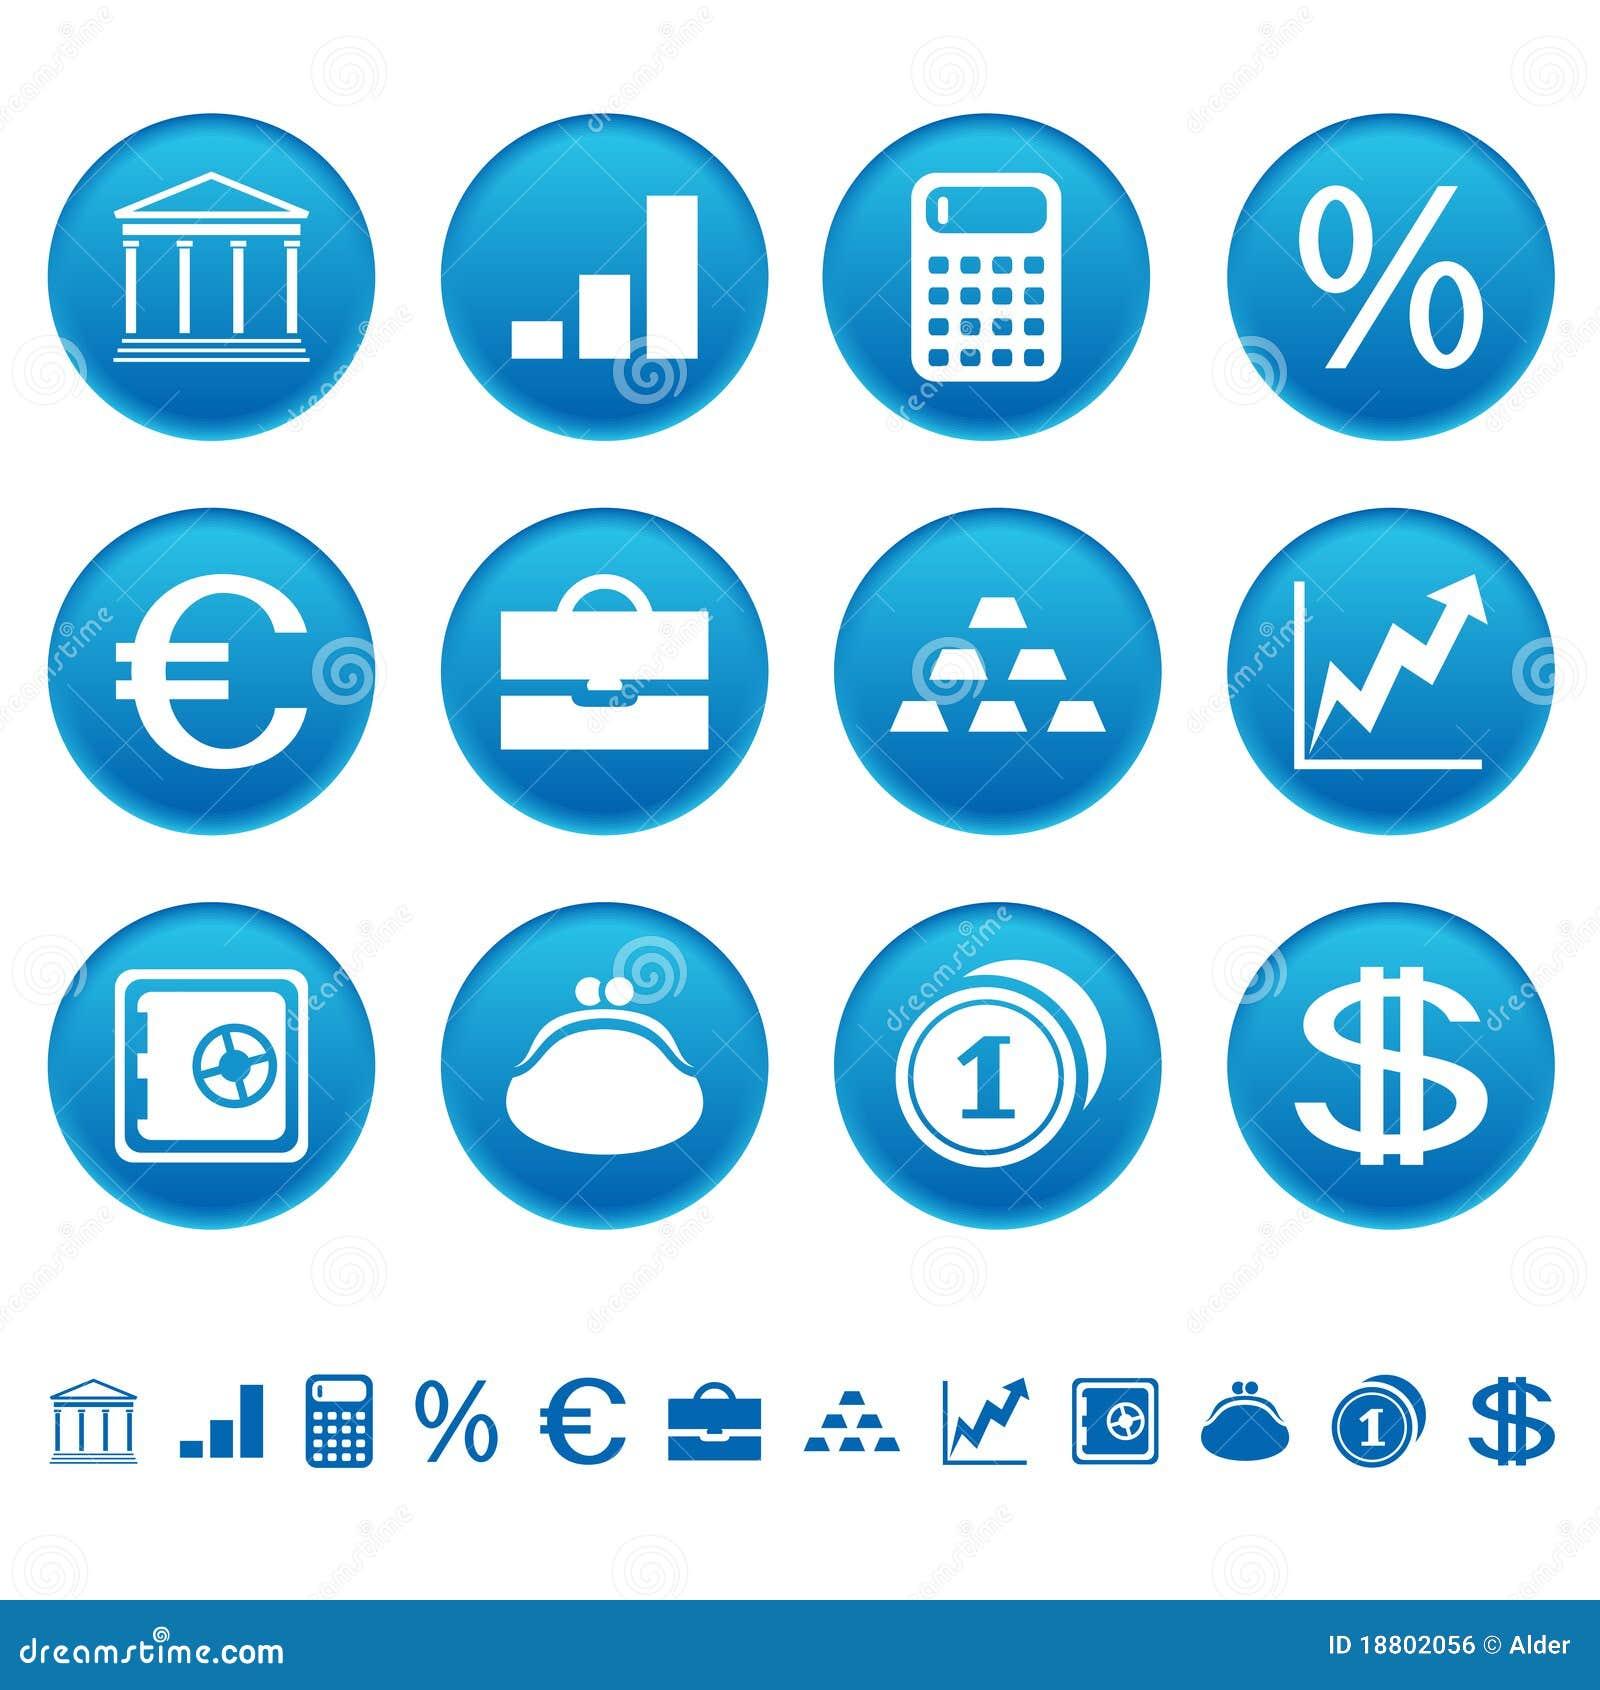 Banks & Finance Icons Royalty Free Stock Image - Image: 18802056